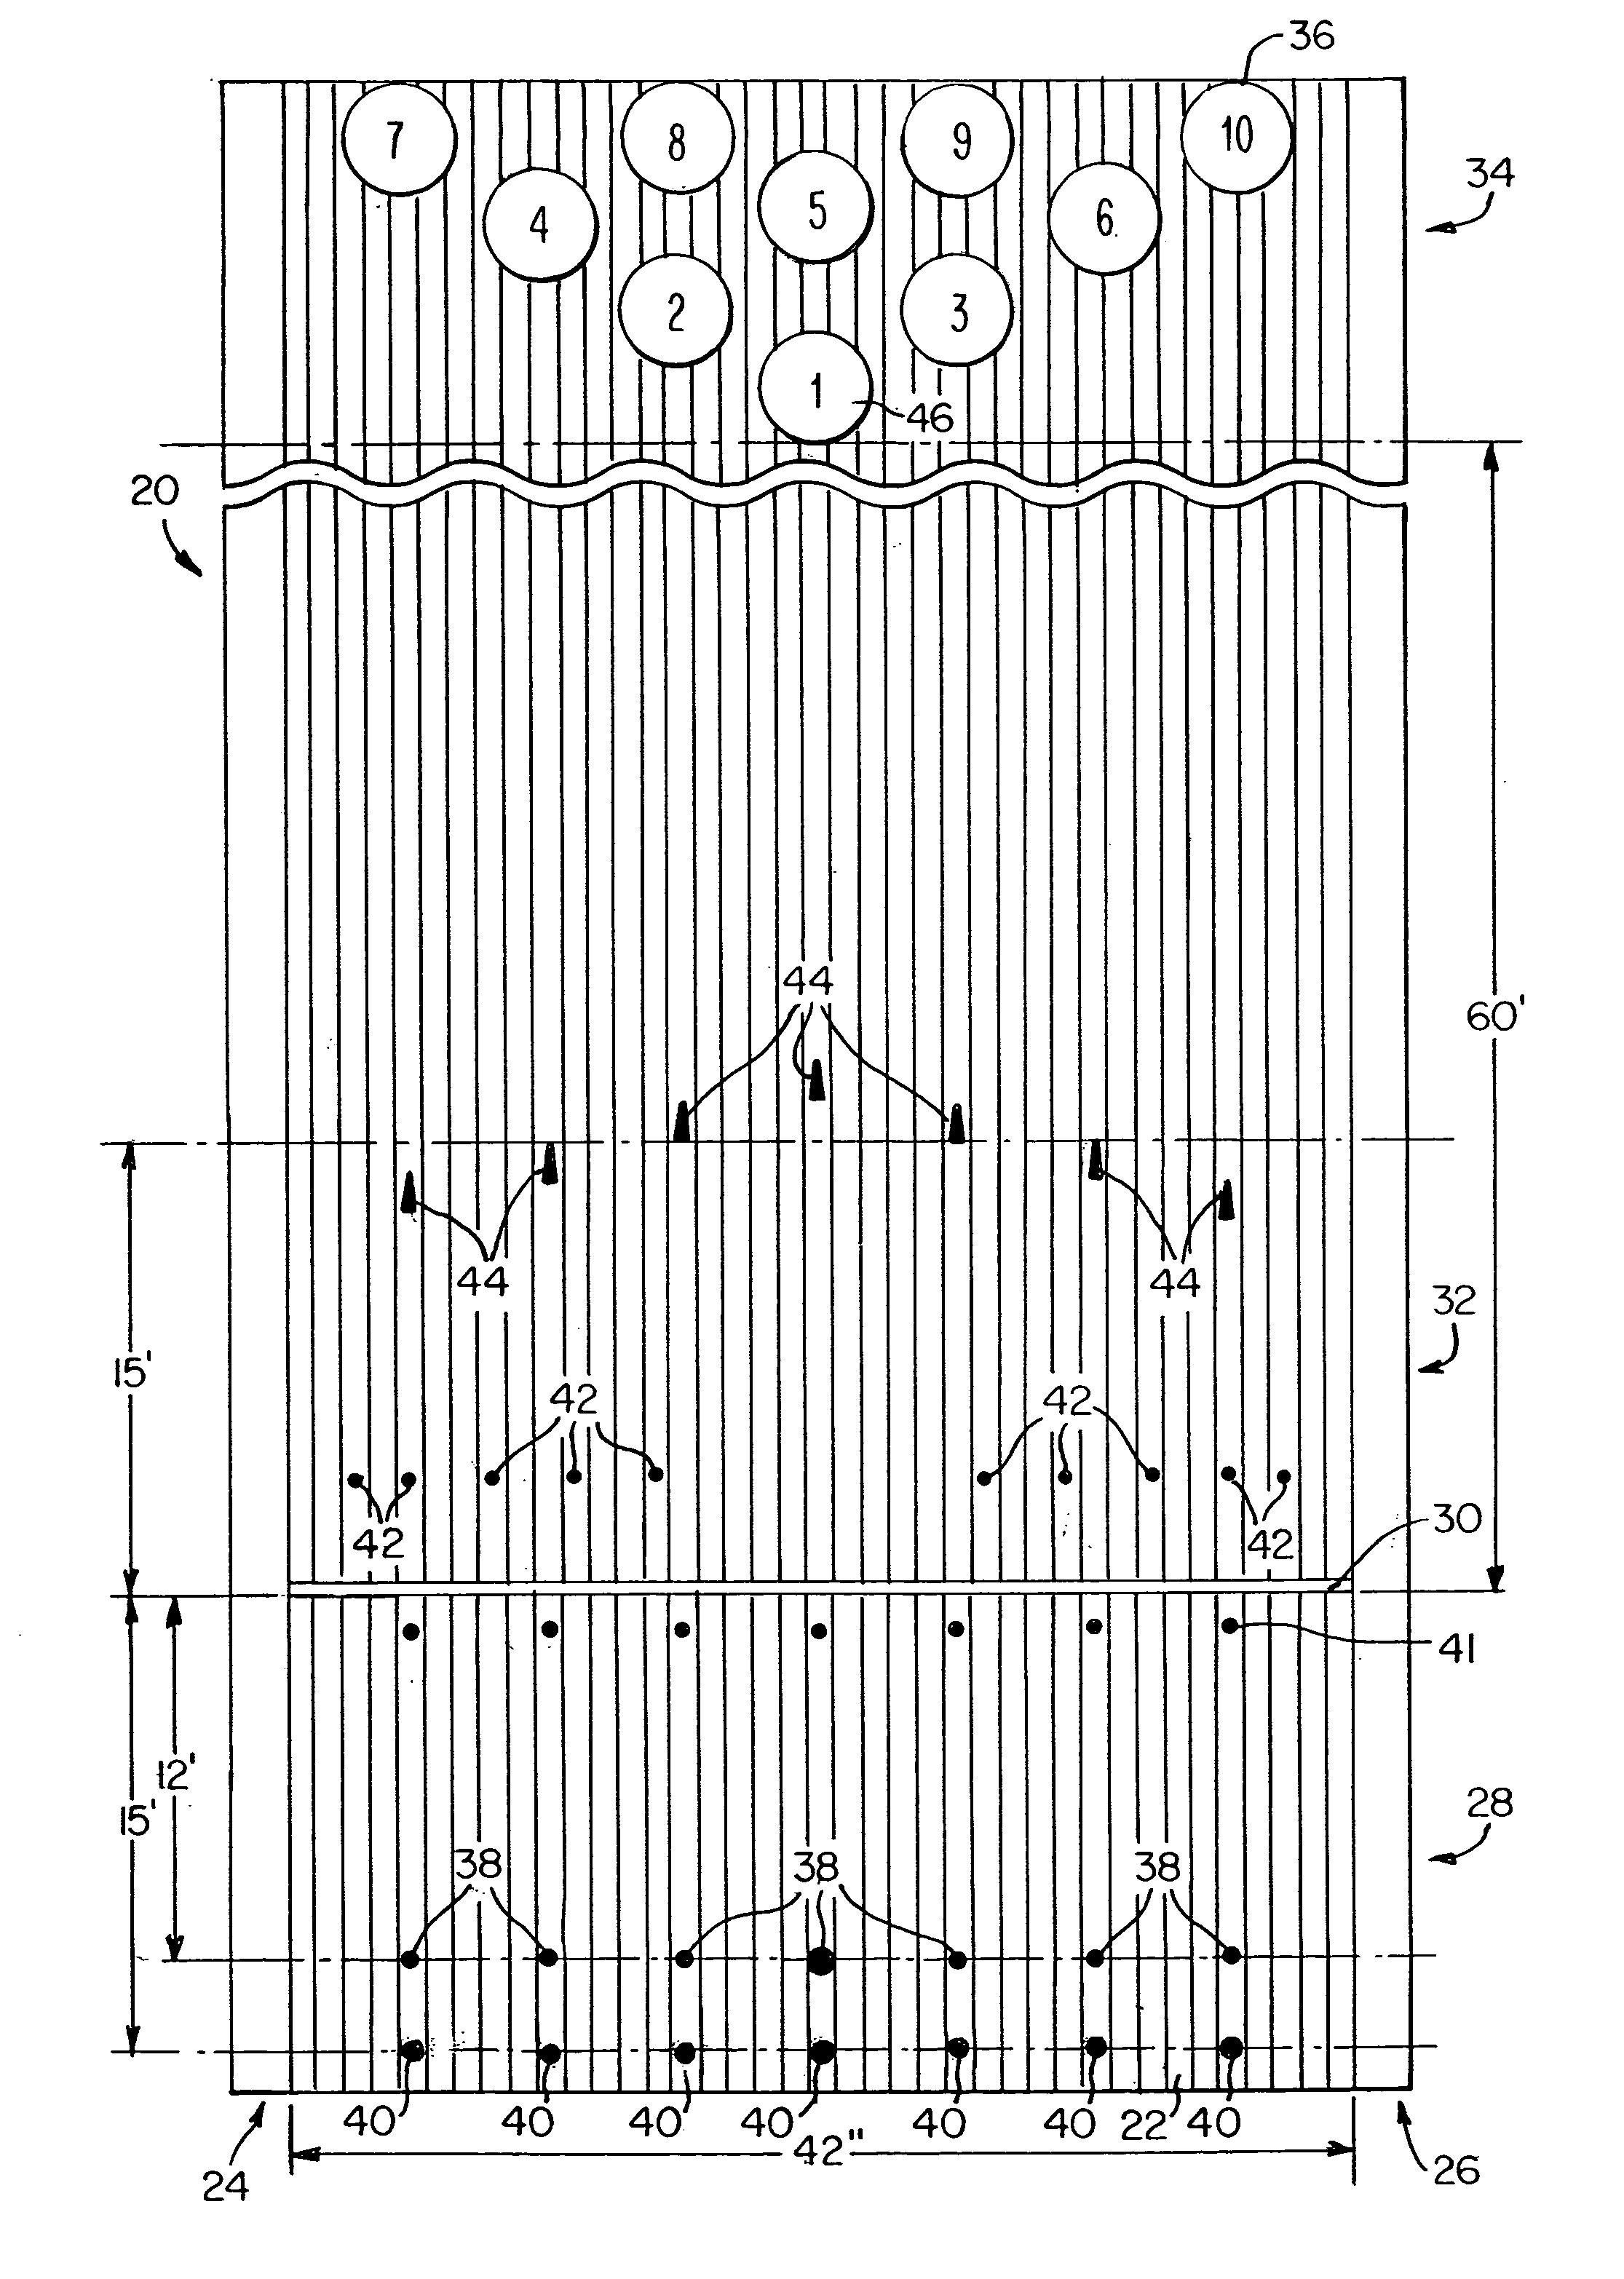 image relating to Printable Bowling Lane Diagram called DIAGRAM] Bowling Alley Sizing Diagram Entire Variation High definition